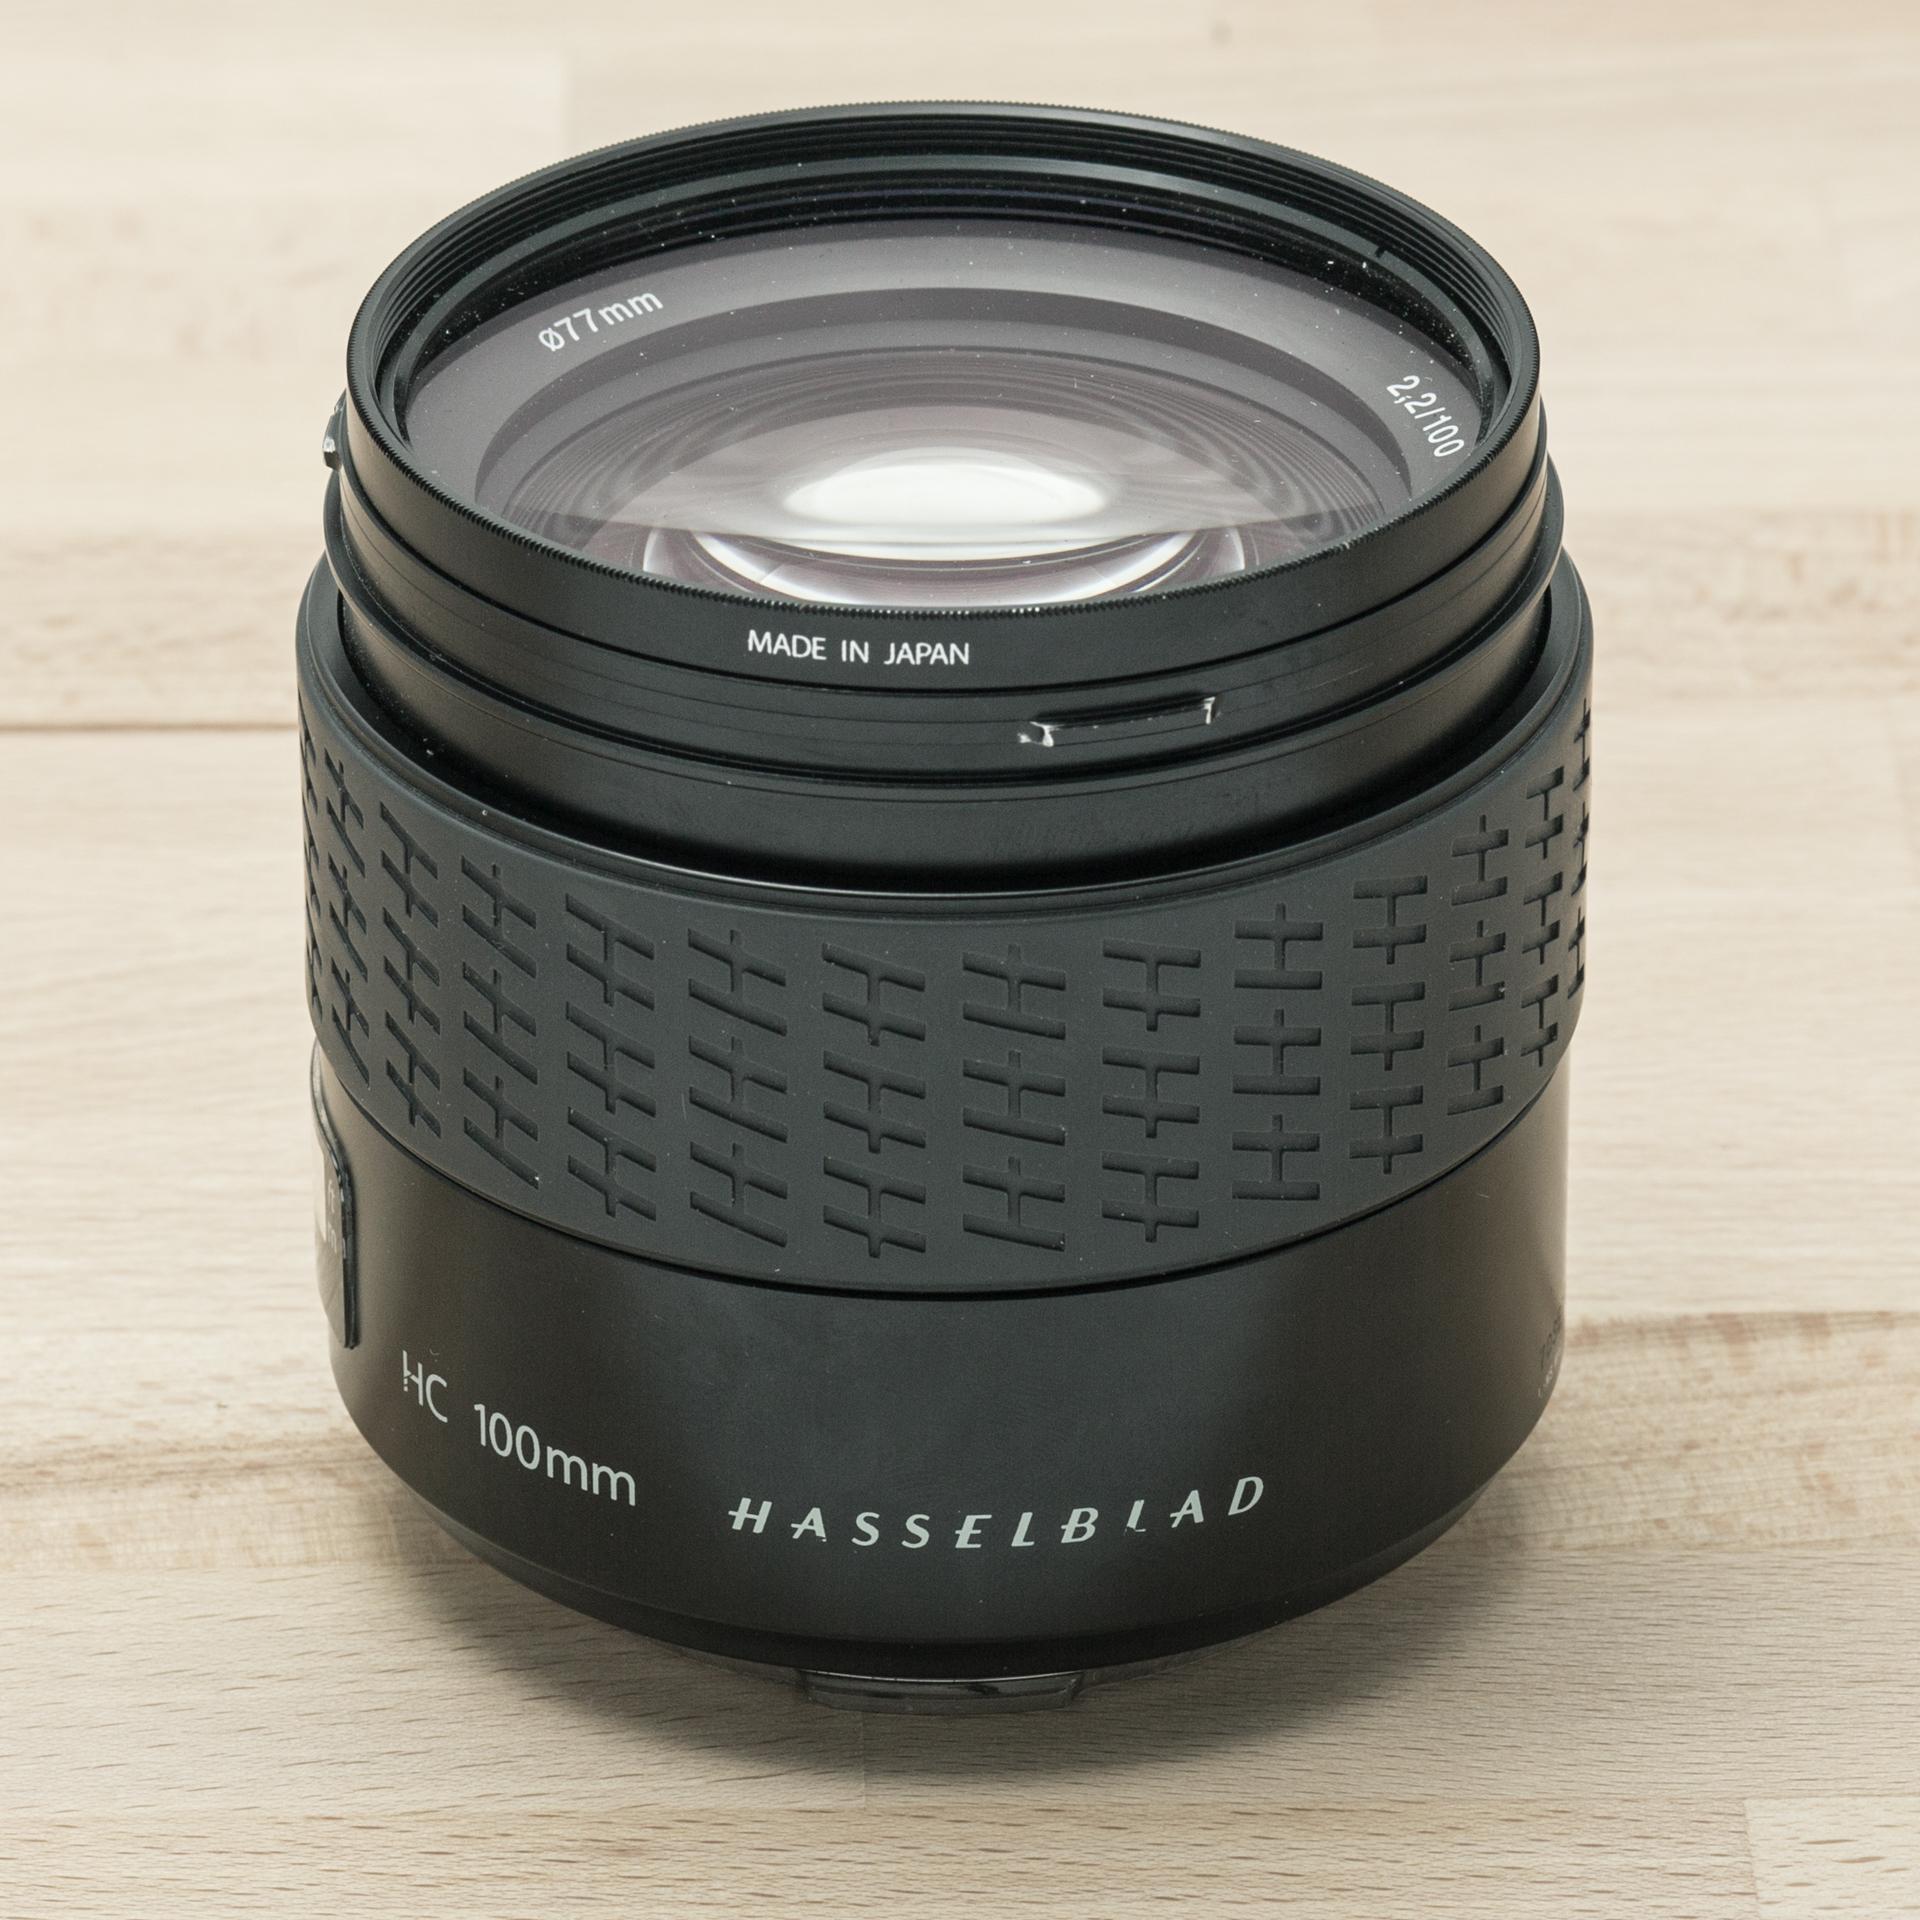 Hasselblad HC 100mm f/2.2 + Lens Shade + UV-Sky 77m // 11.915 exposures